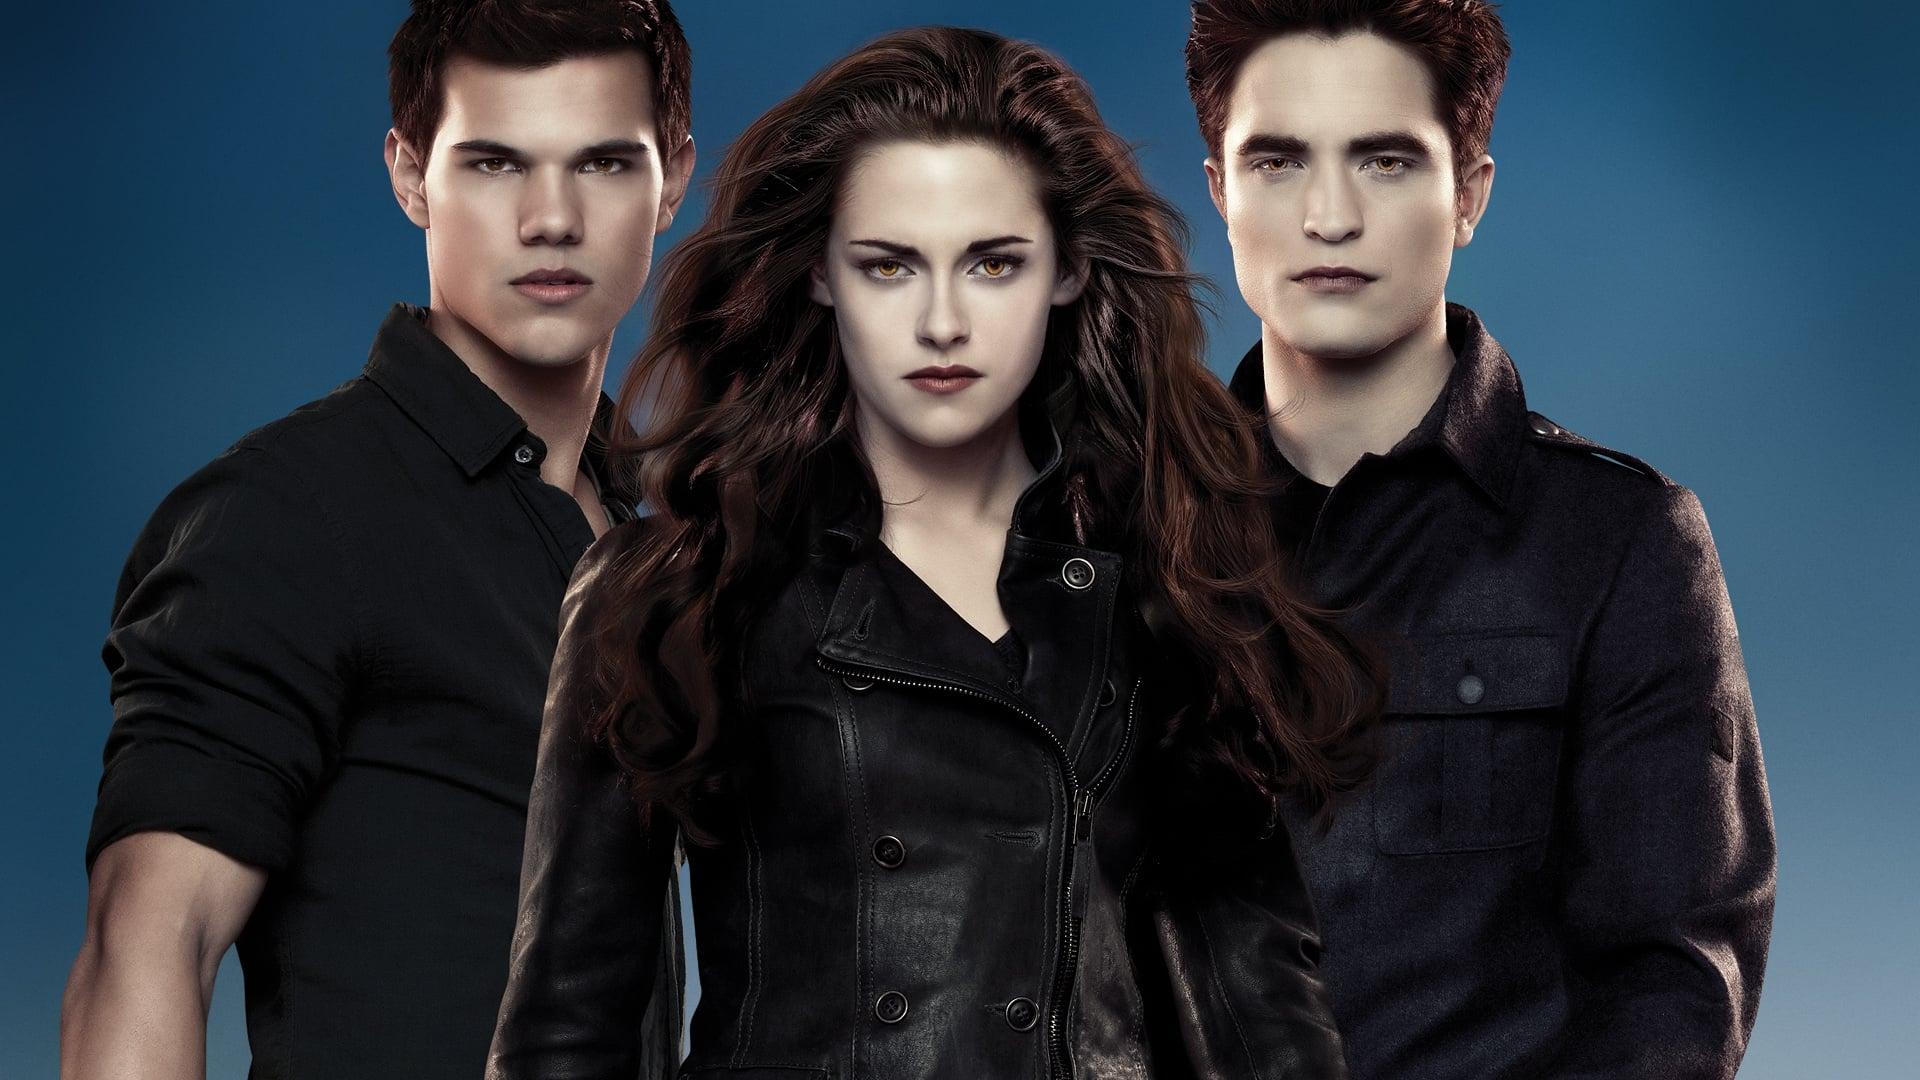 Twilight Kinox.To